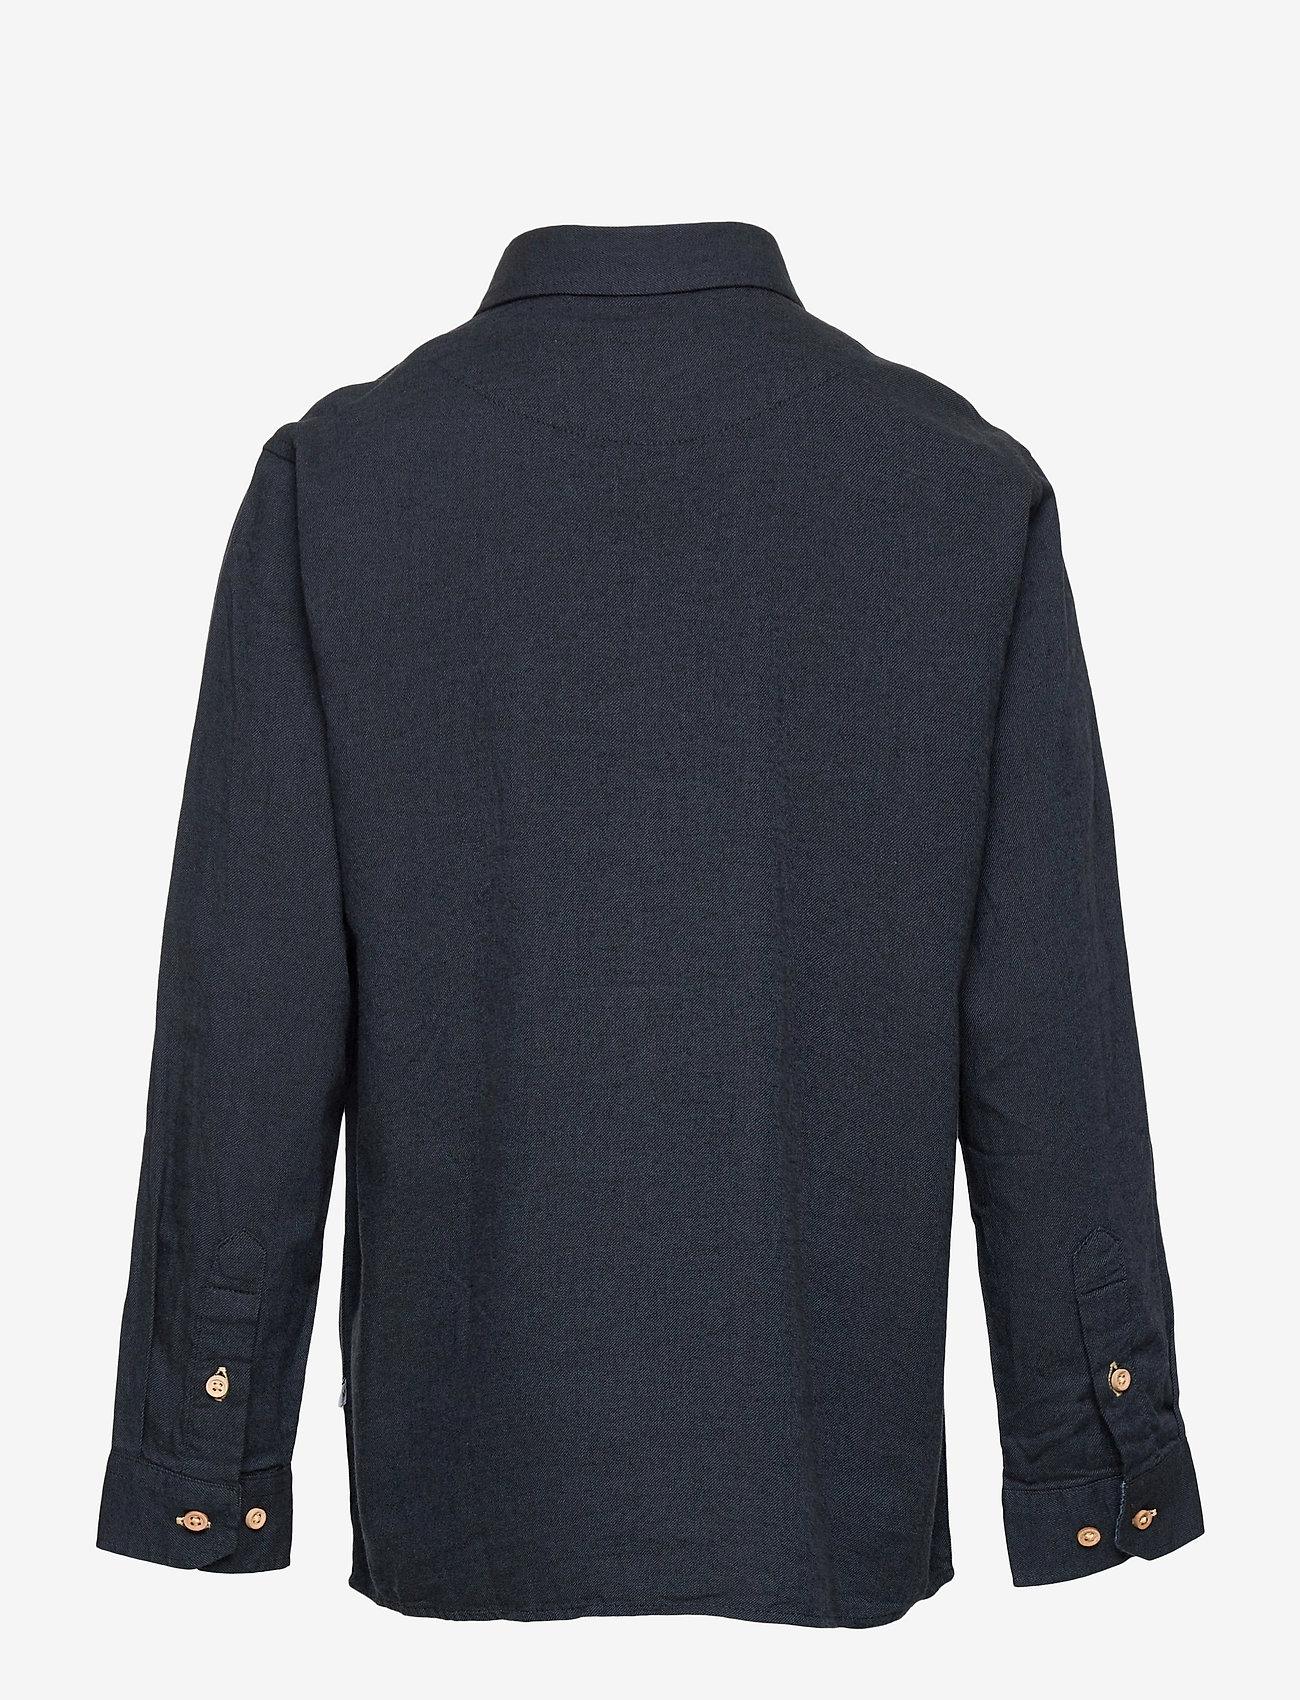 Kronstadt - Johan Diego - shirts - navy - 1